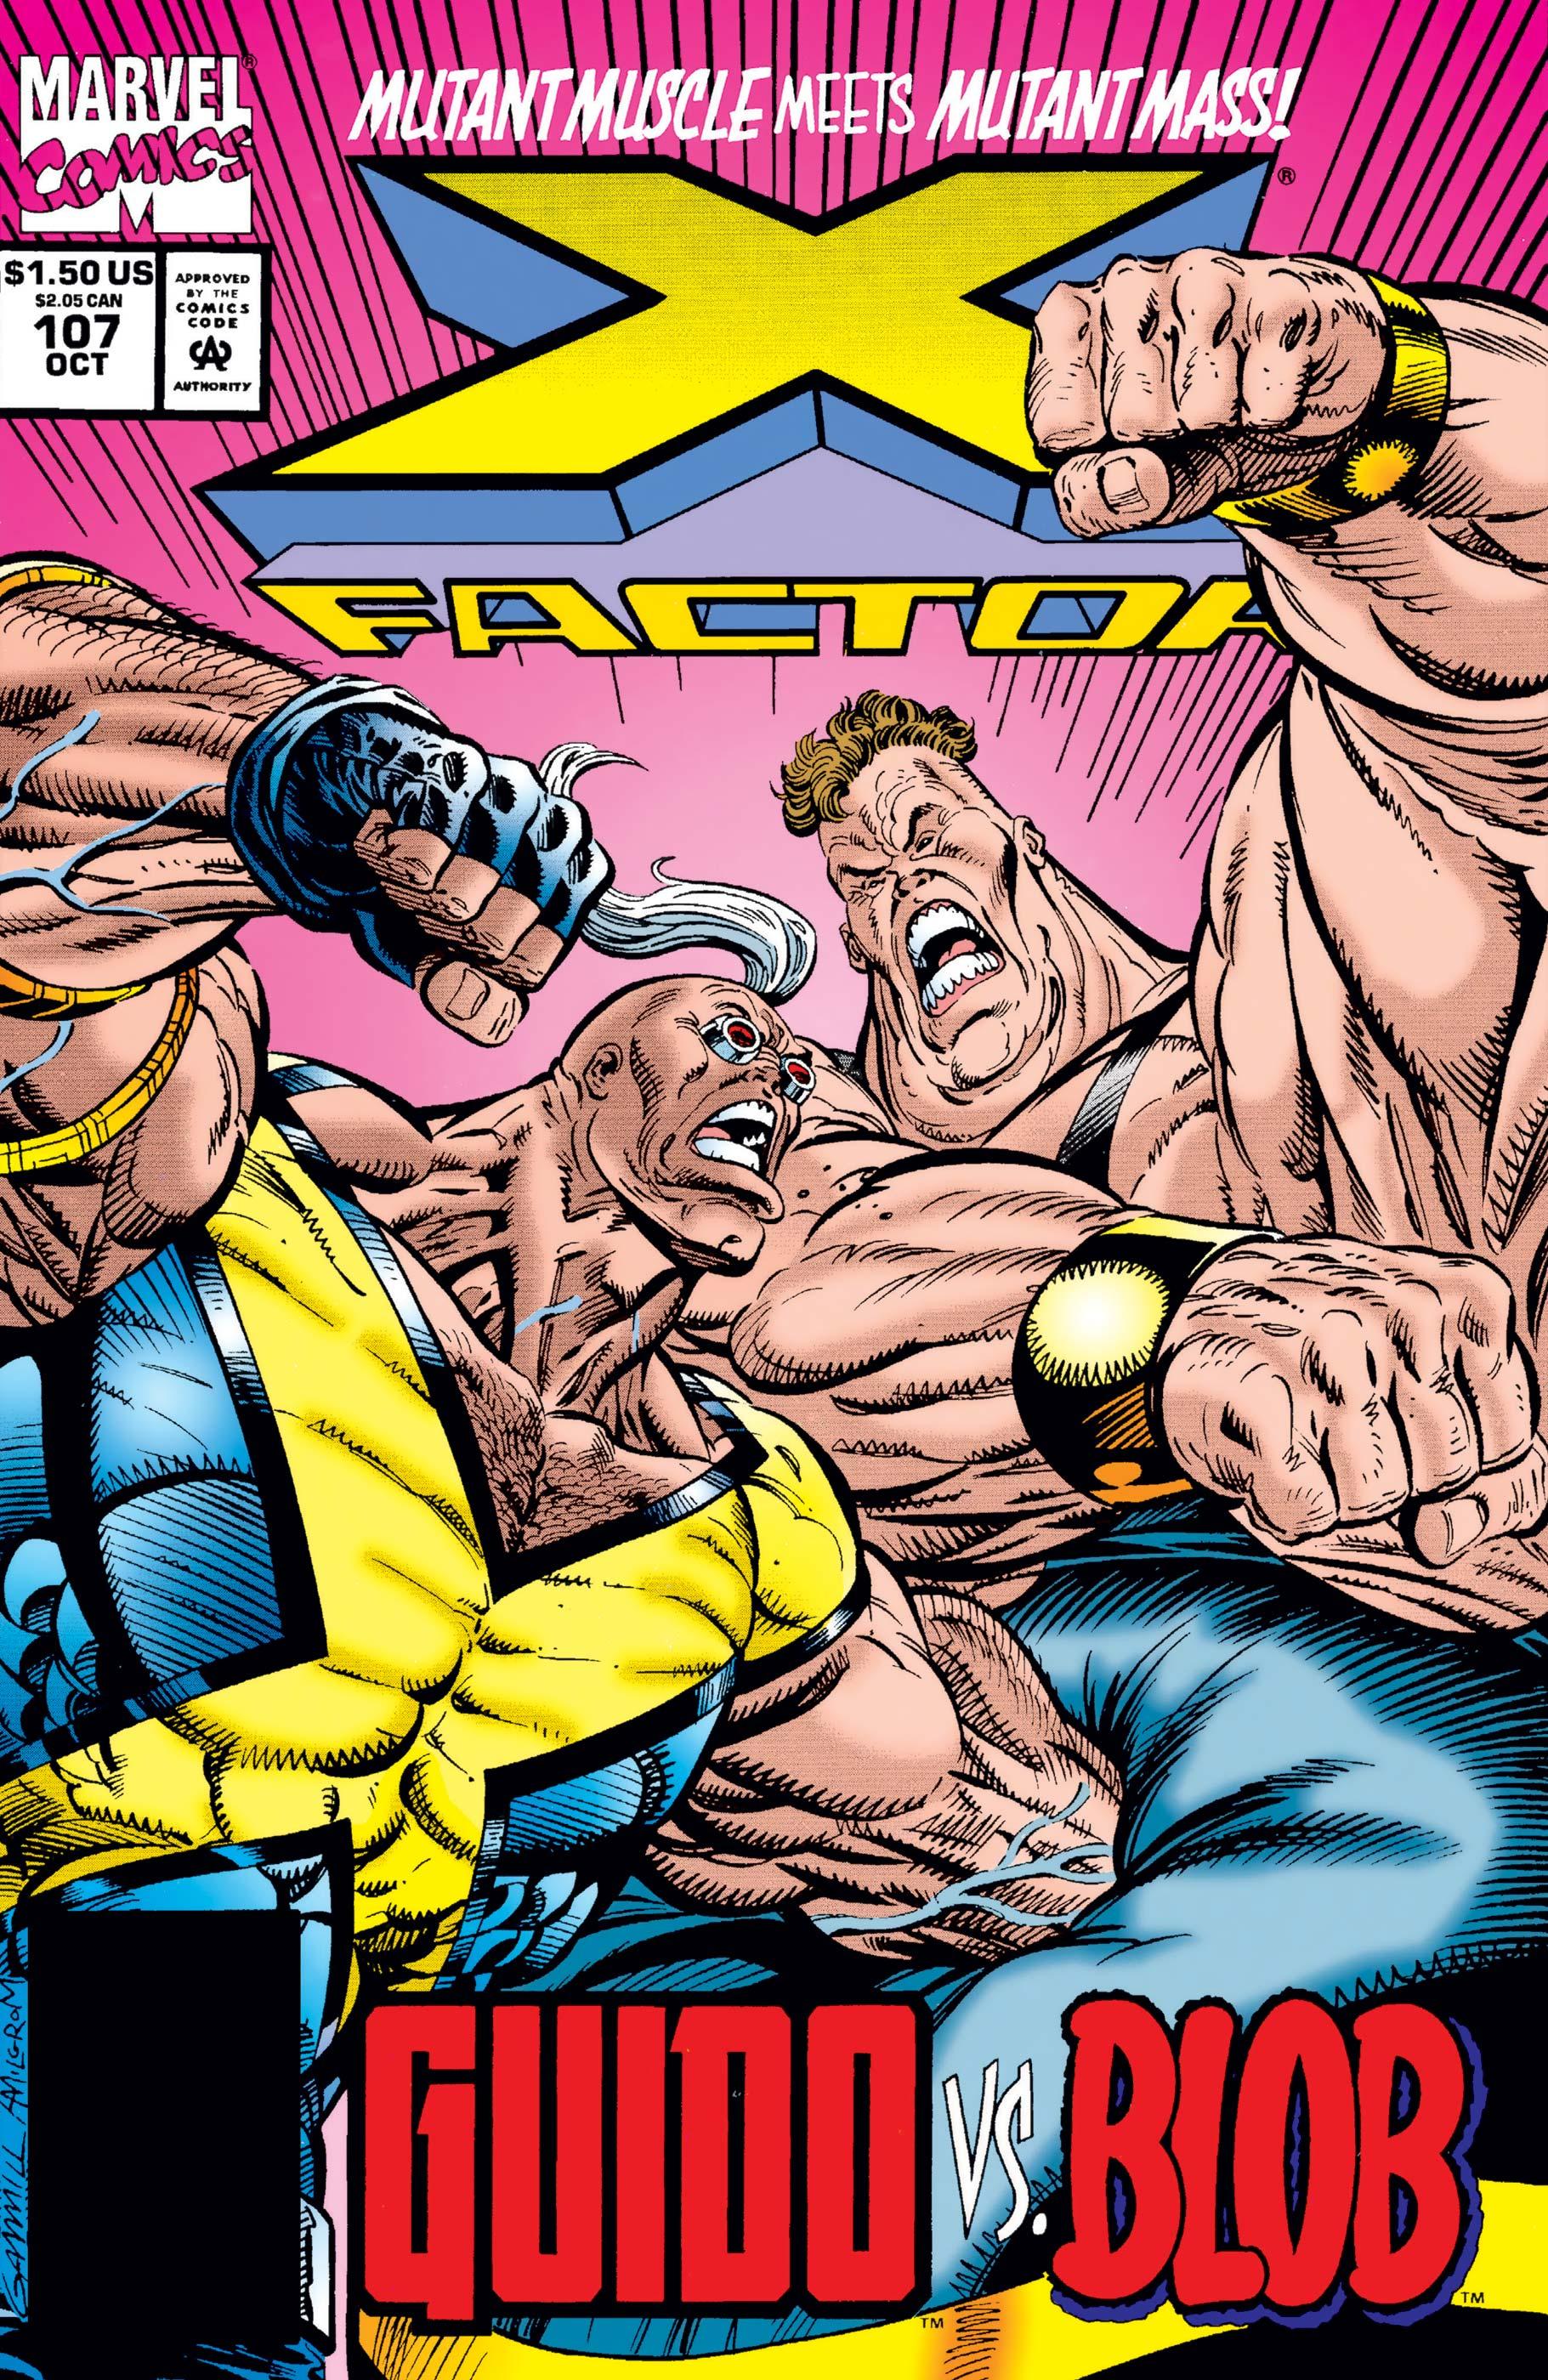 X-Factor (1986) #107